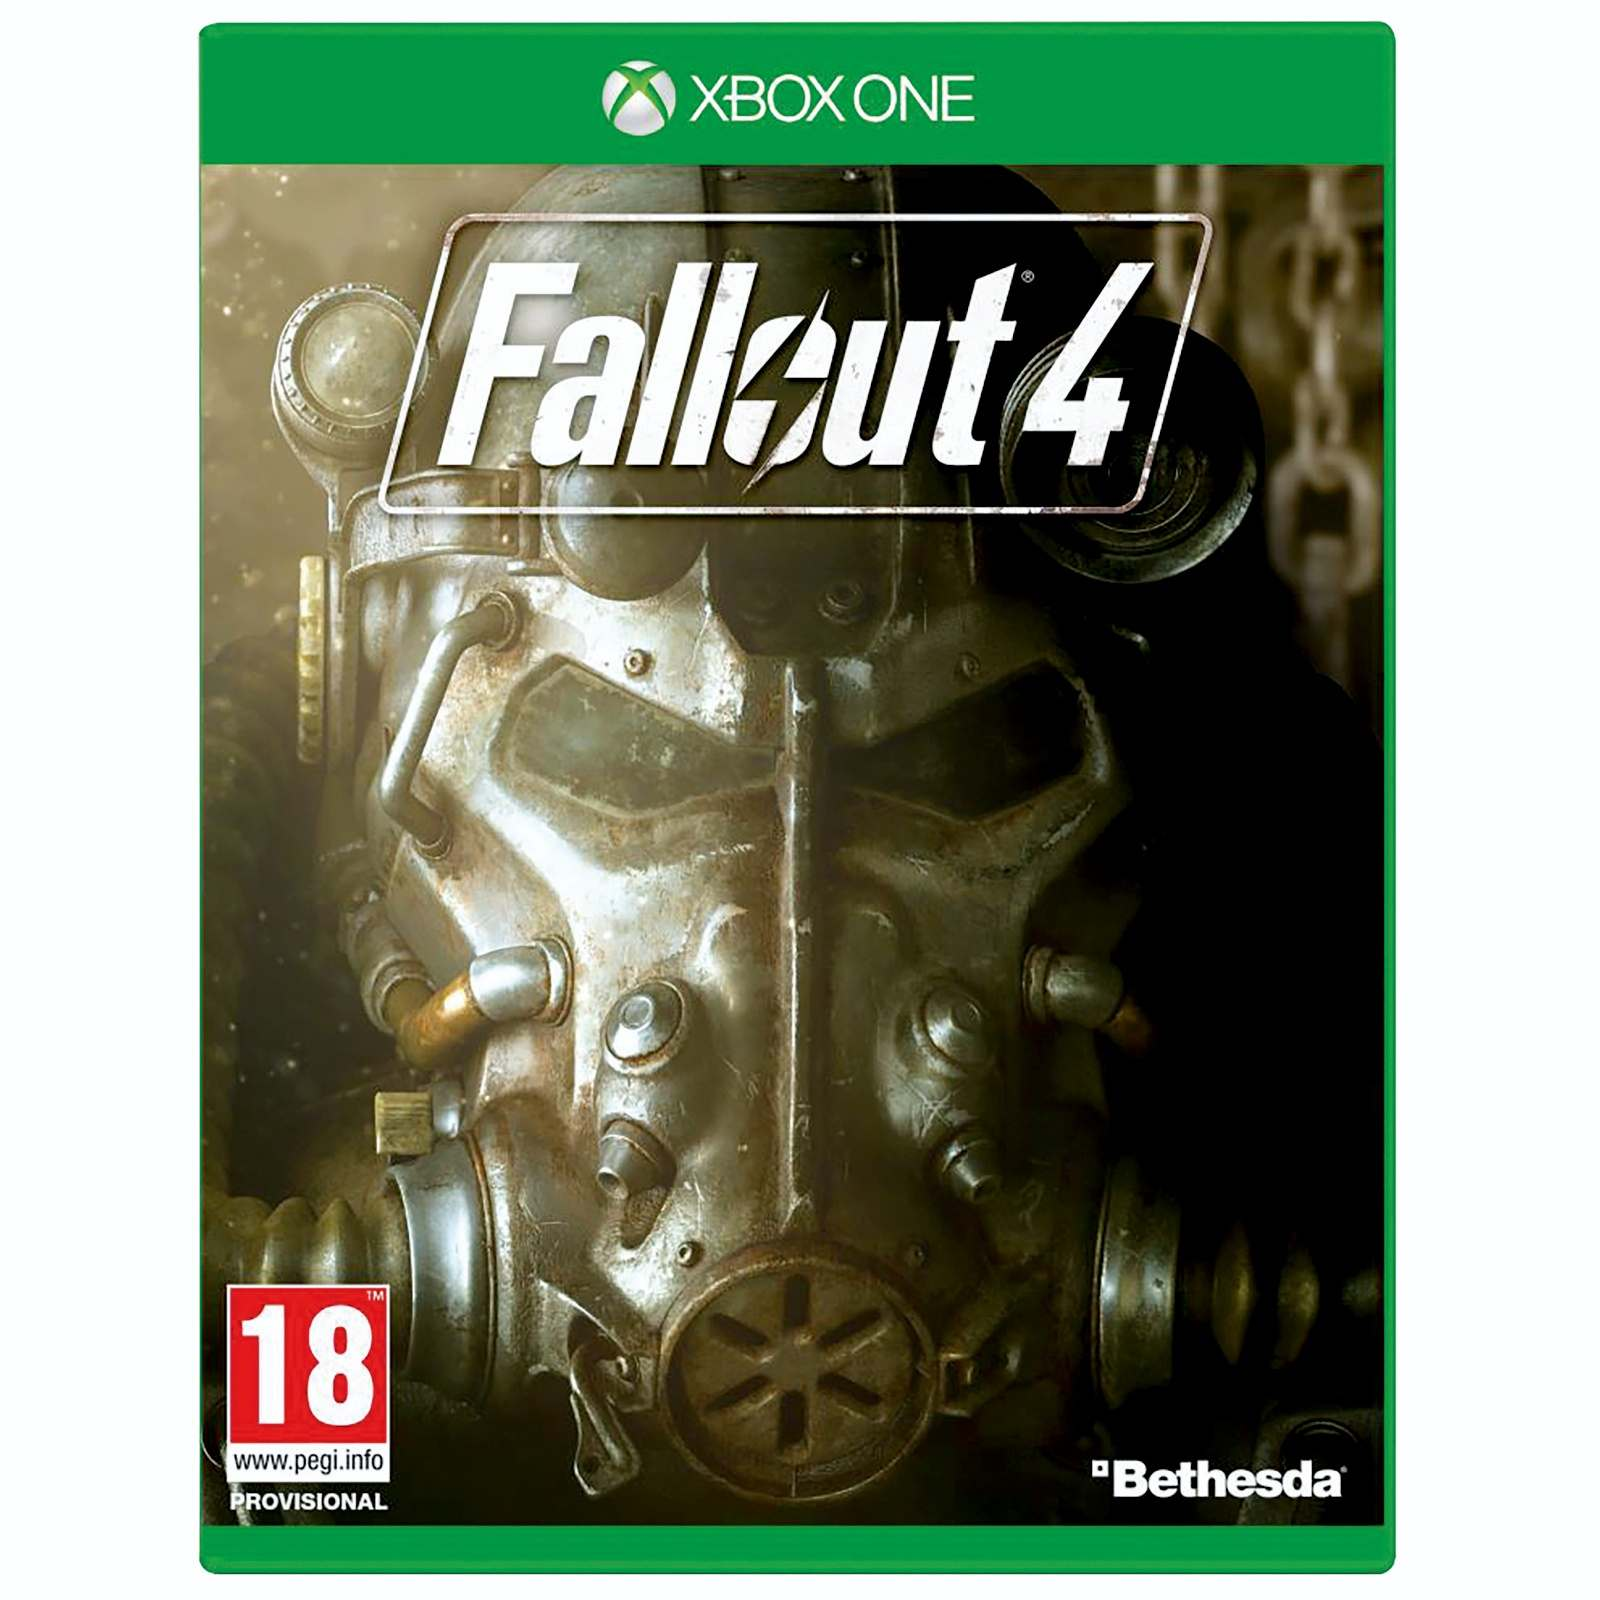 ���� ��� Xbox One MICROSOFT Xbox One Fallout 4